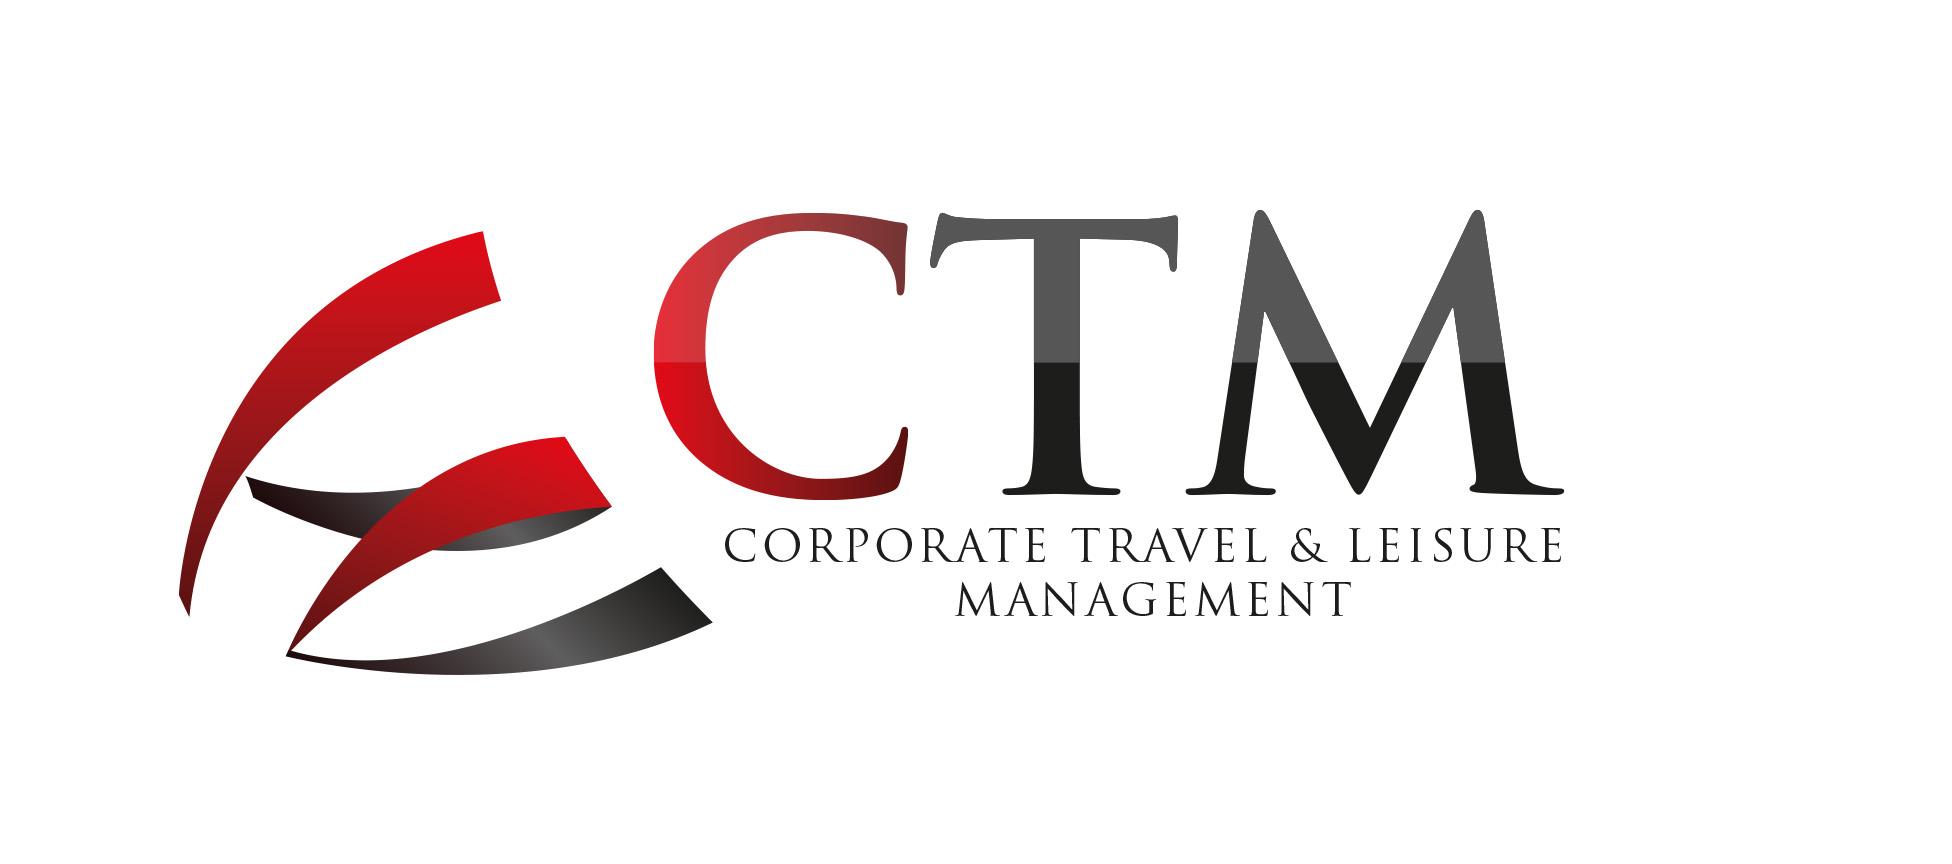 Corporate Travel & Leisure Management, Kenya